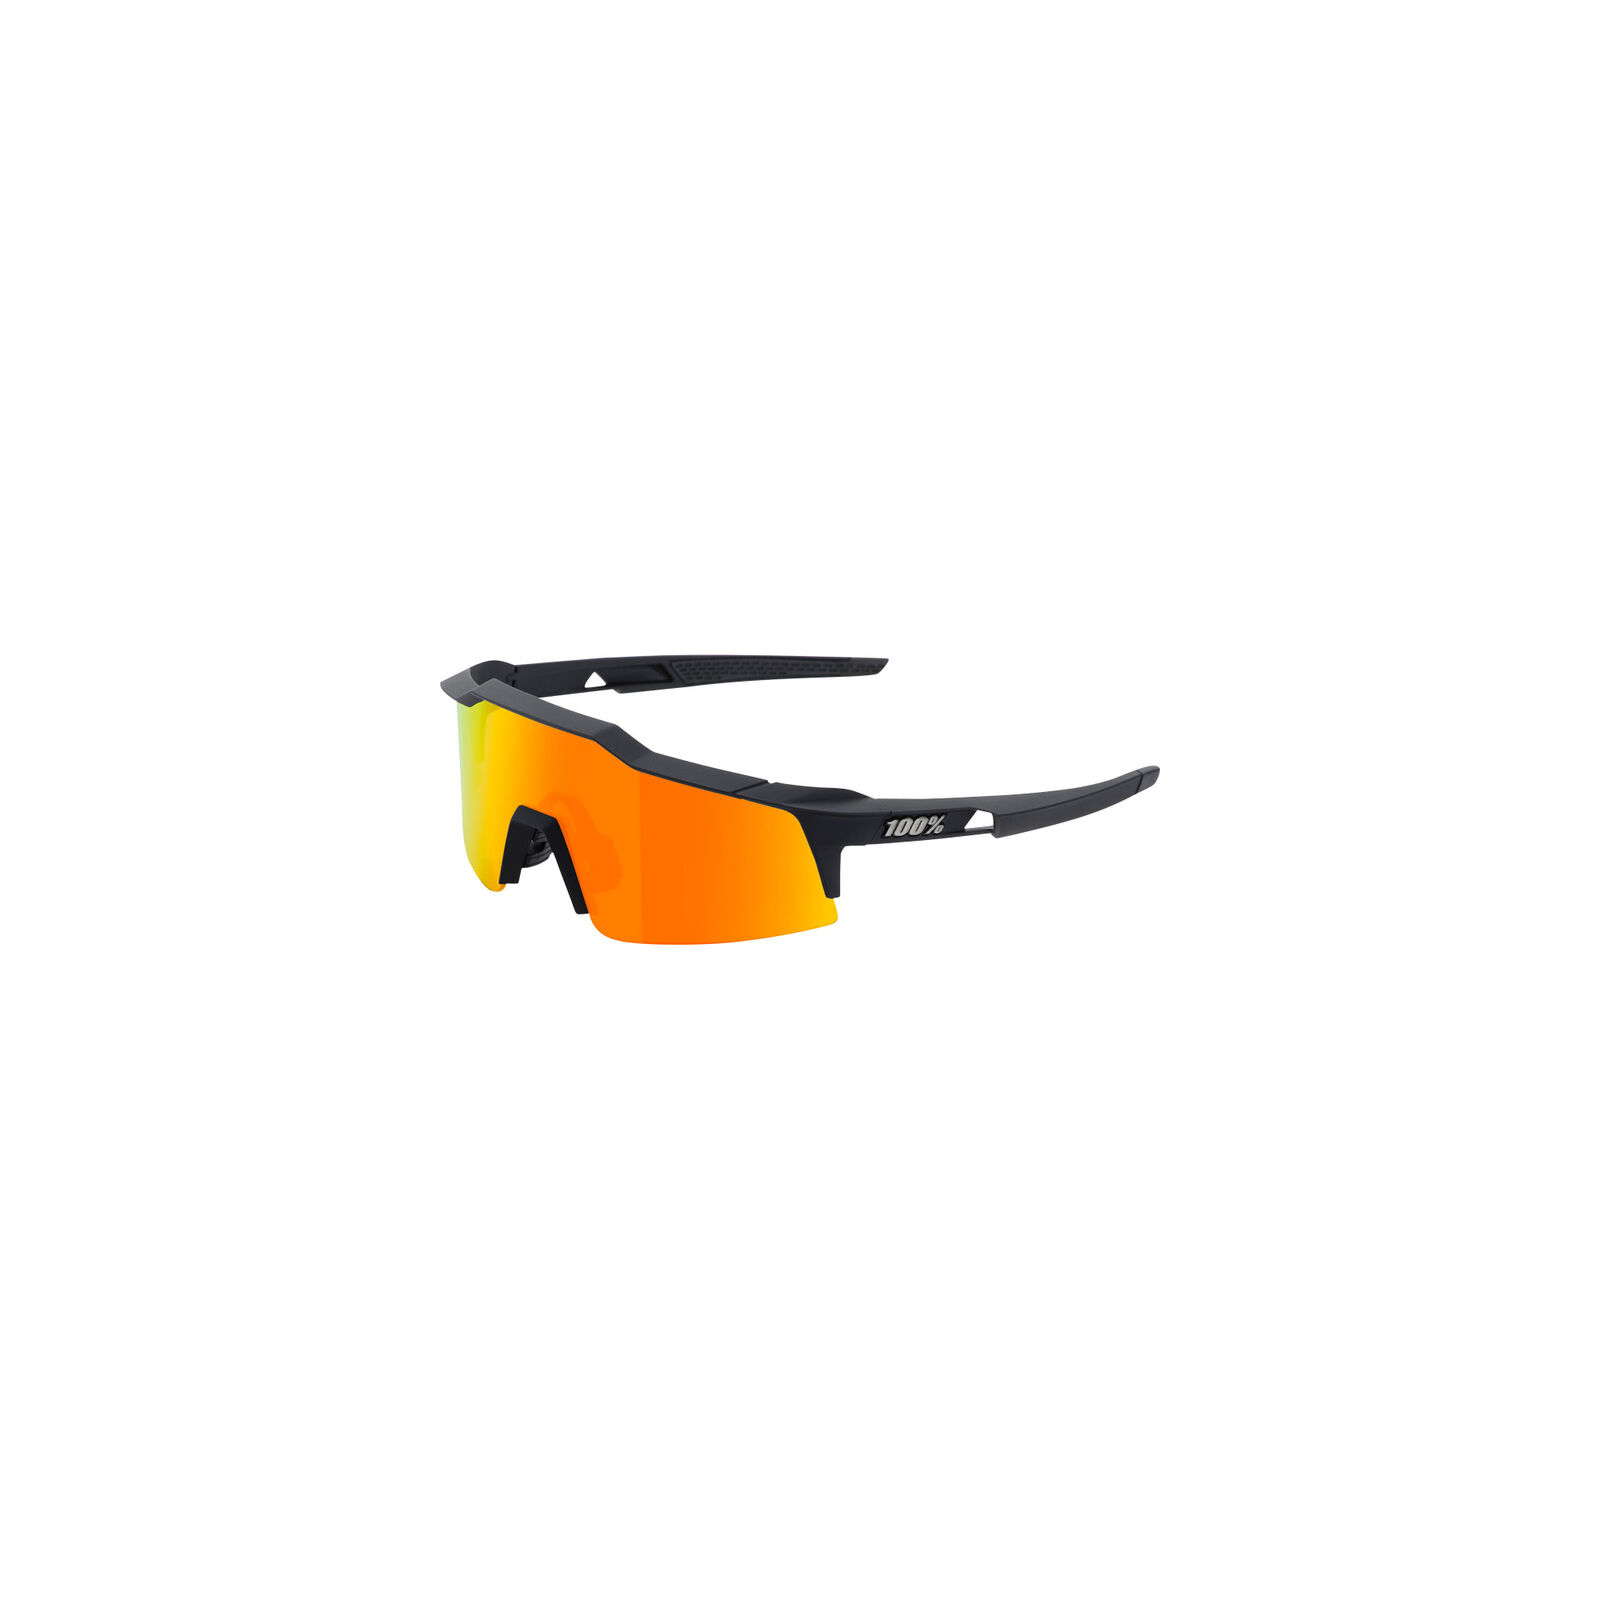 100% Speedcraft SL Gafas de Sol Negro Negro Negro Hiper Rojo Multilayer Lentes Espejados bf8152